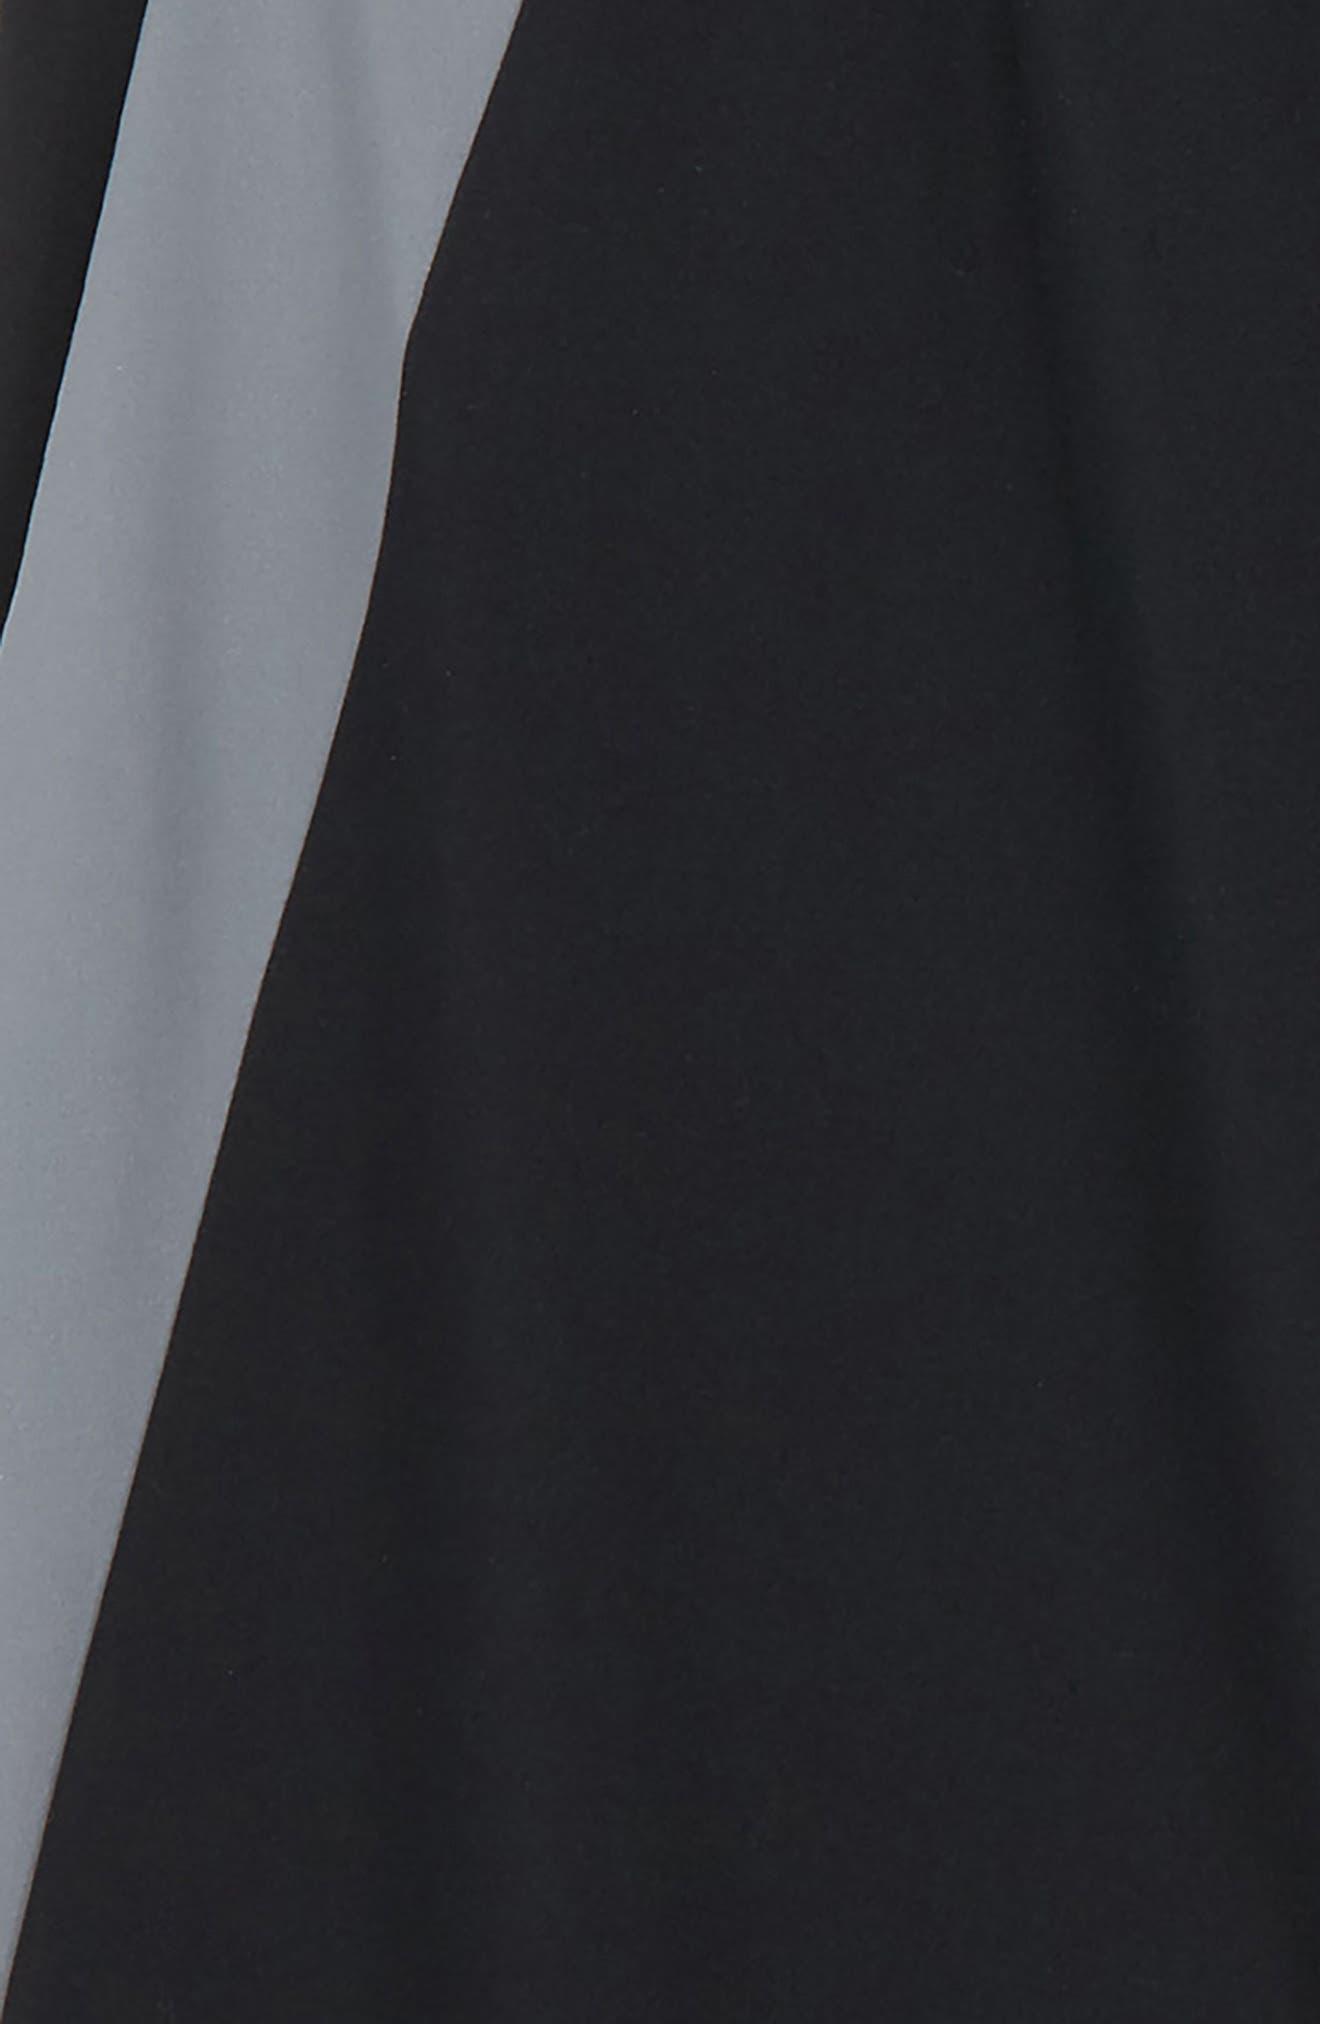 Dry Training Shorts,                             Alternate thumbnail 2, color,                             BLACK/ COOL GREY